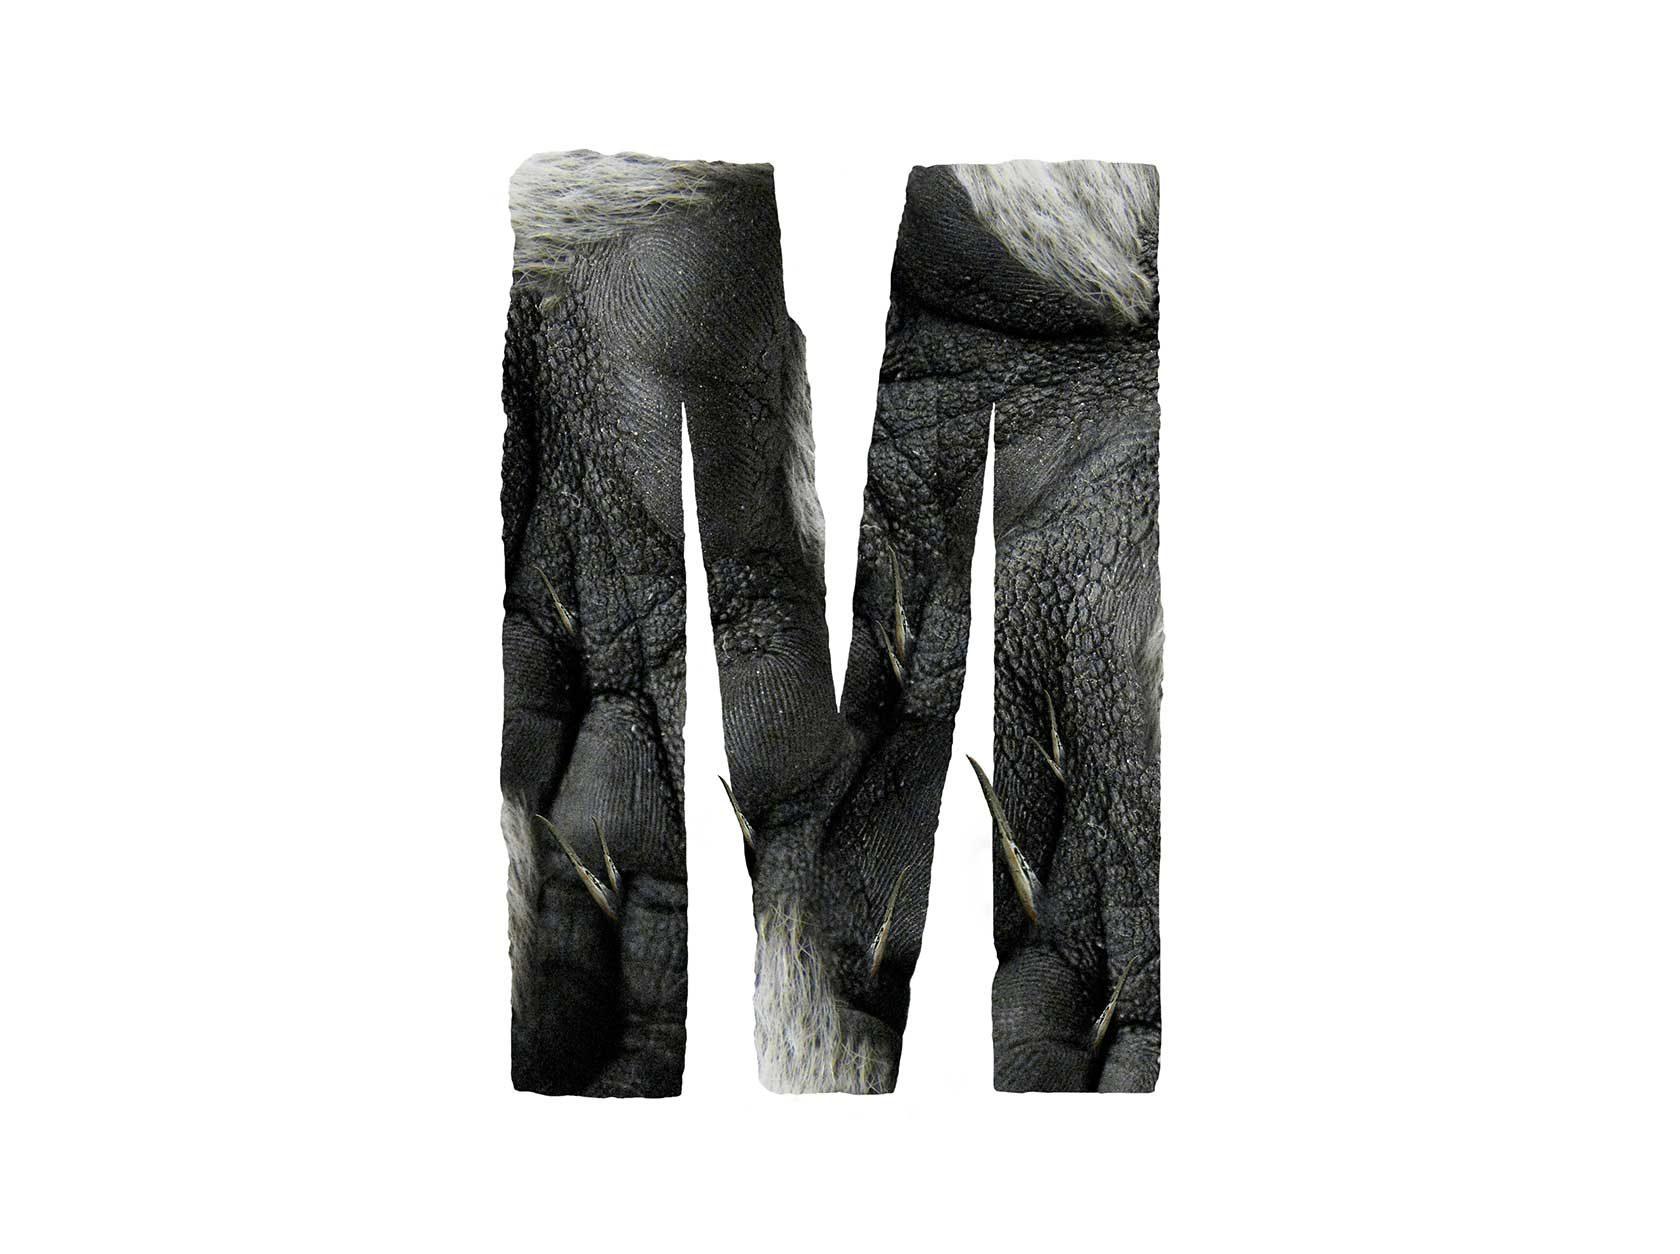 Bird Headed Monster Letter M Design by Furia